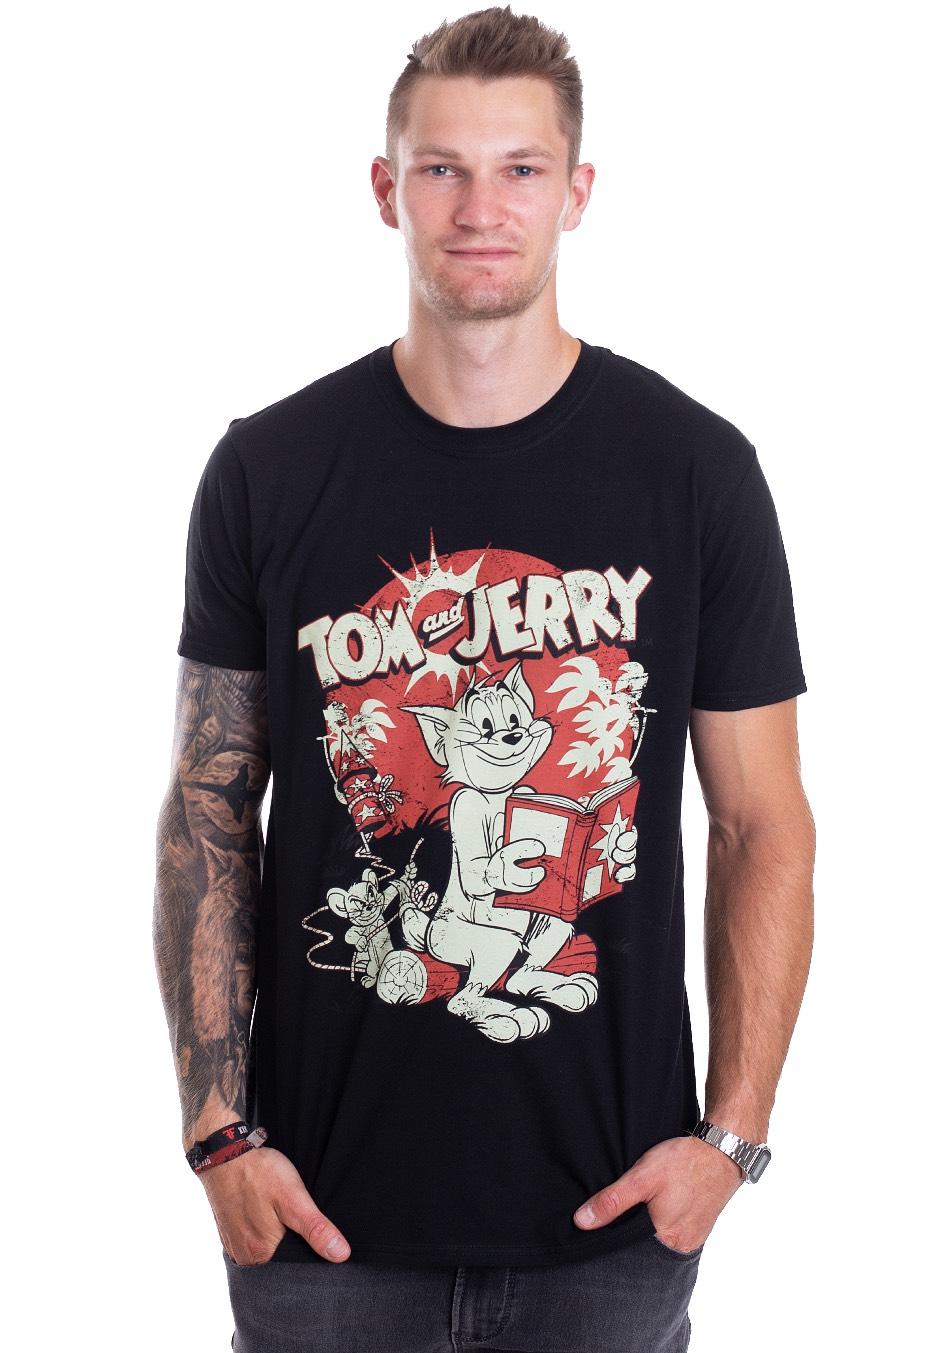 Tom And Jerry - Vintage Comic - T-Shirt - Impericon.com DE